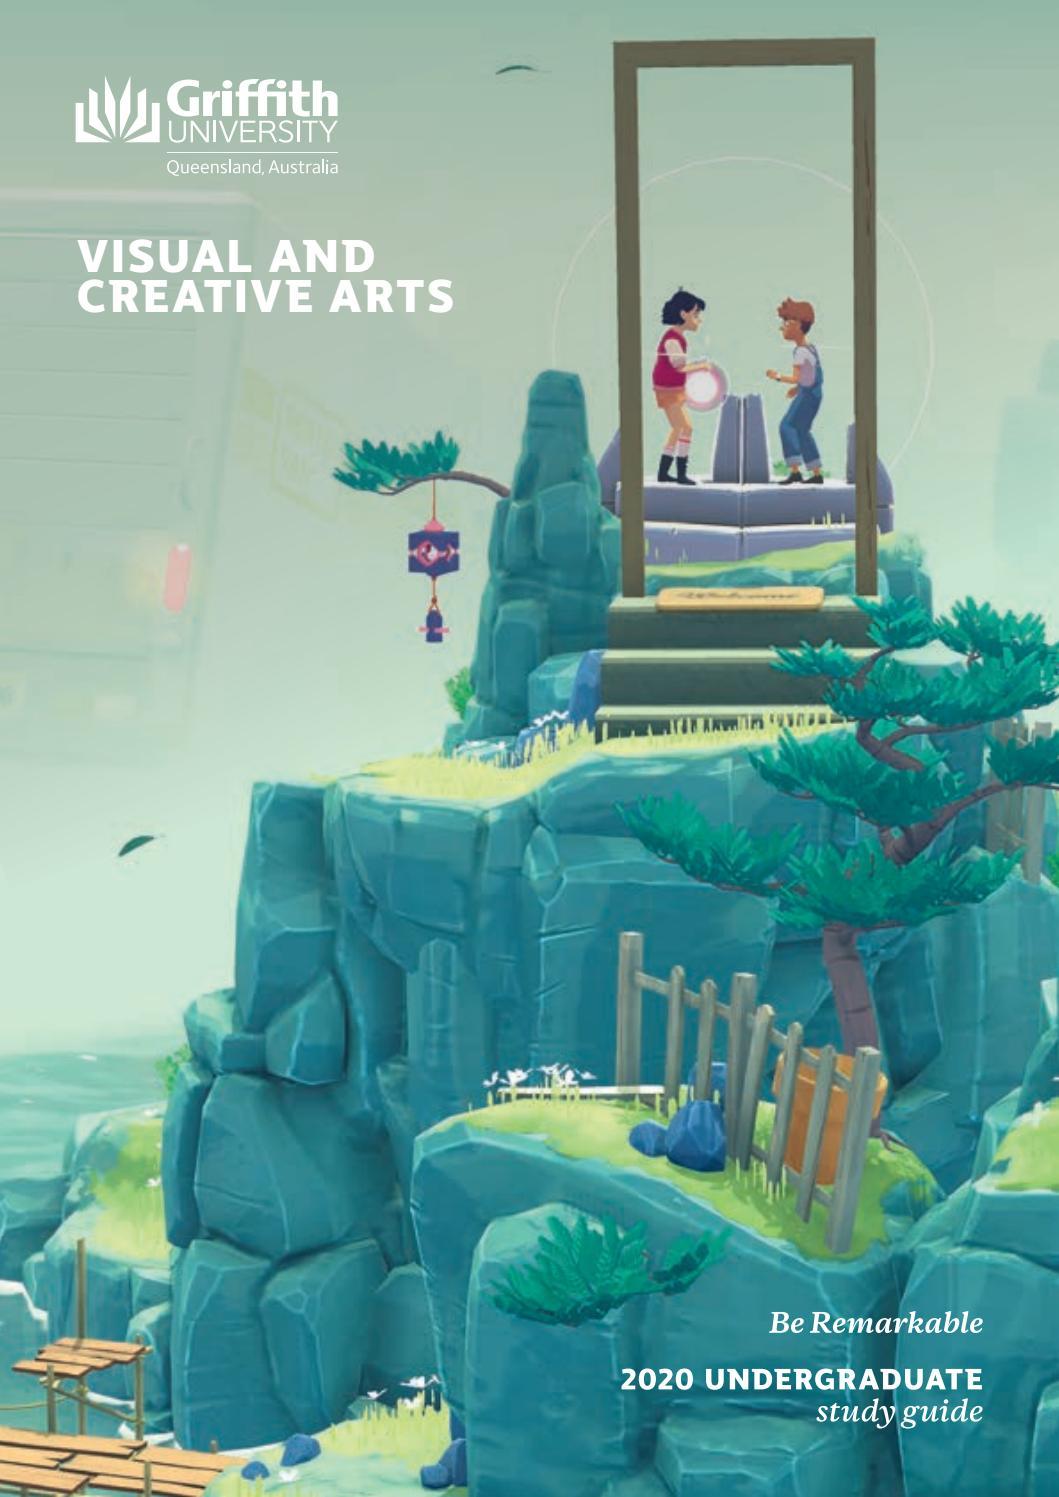 Visual And Creative Arts Study Guide 2020  Griffith regarding Qut Calendar 2020